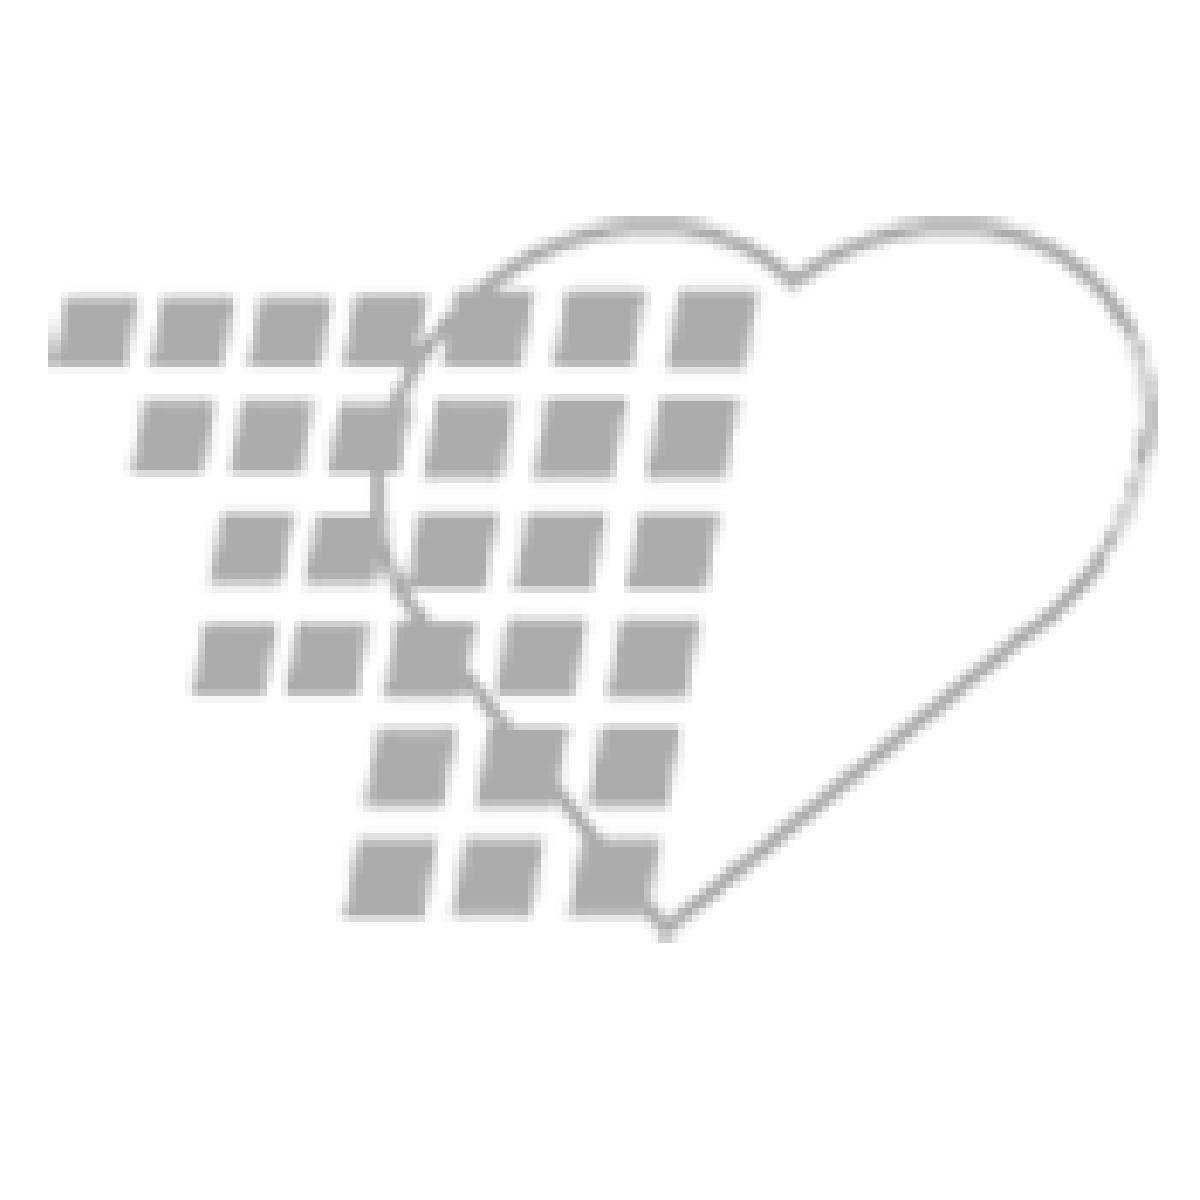 07-71-5000 Voldyne® 5000 Incentive Spirometer